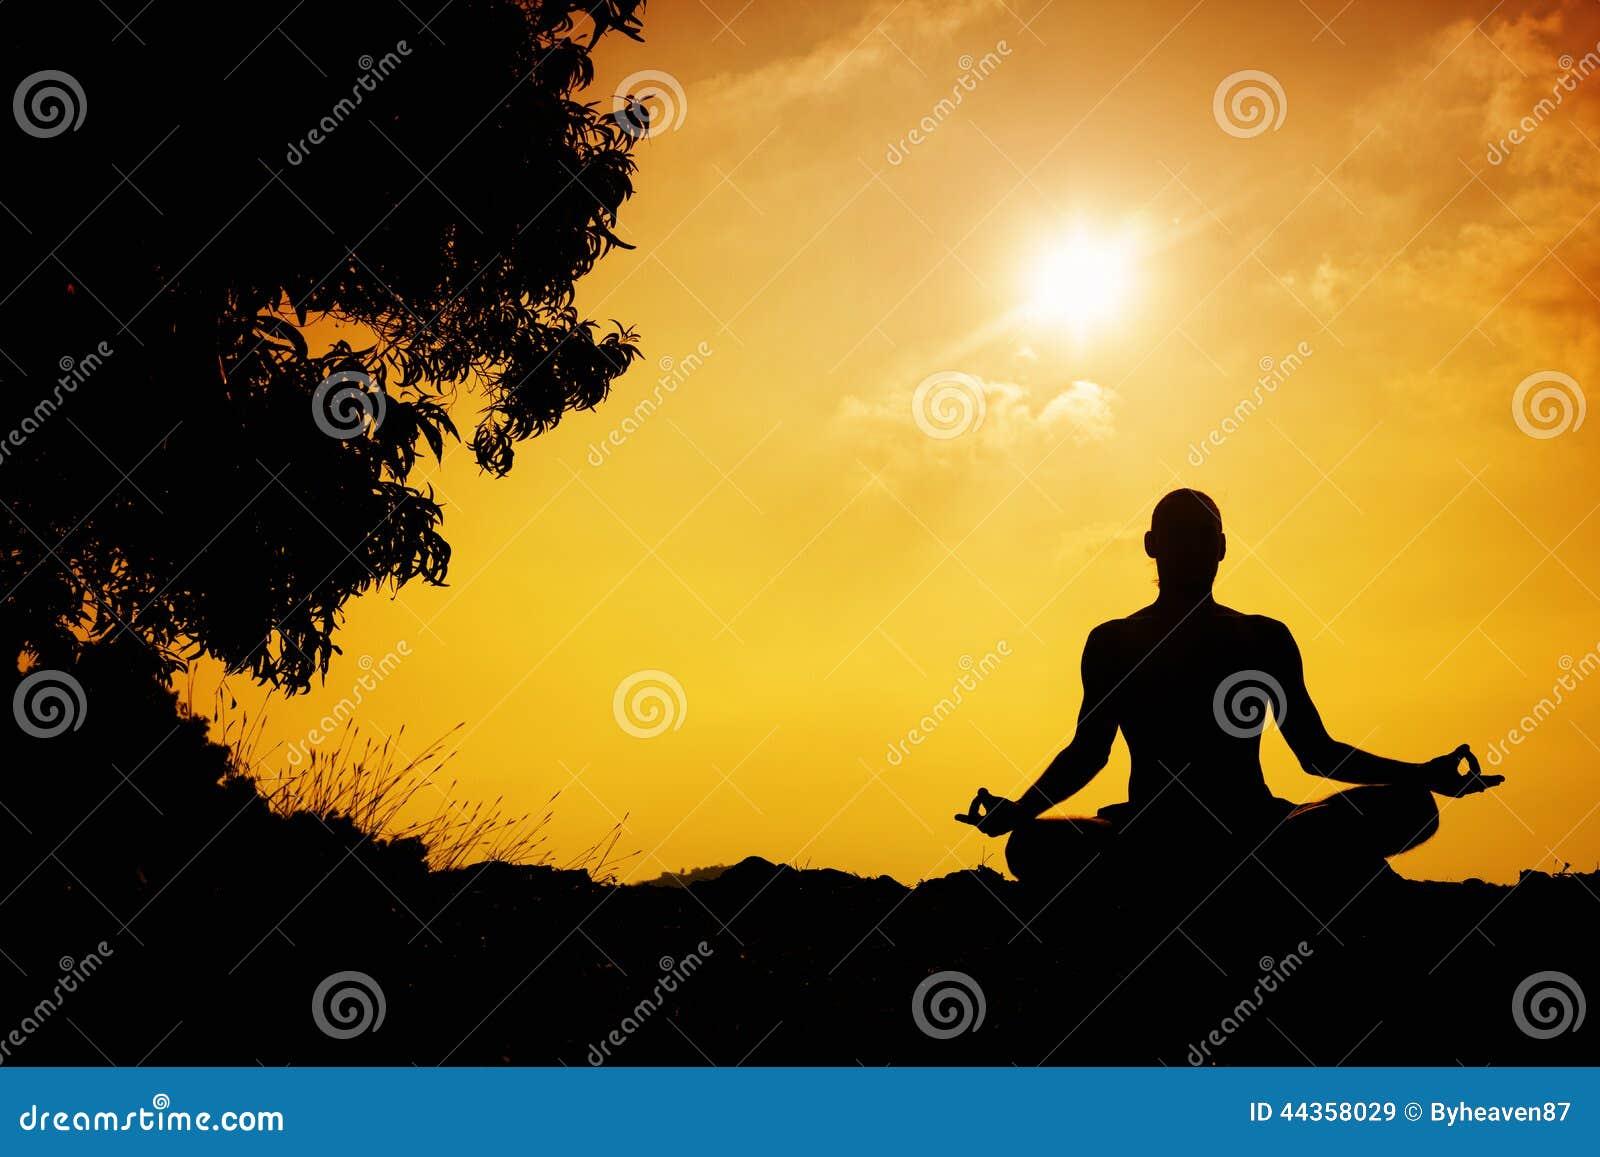 Man silhouette in Yoga meditation pose near the tree at sunset in    Yoga Meditation Pose Silhouette